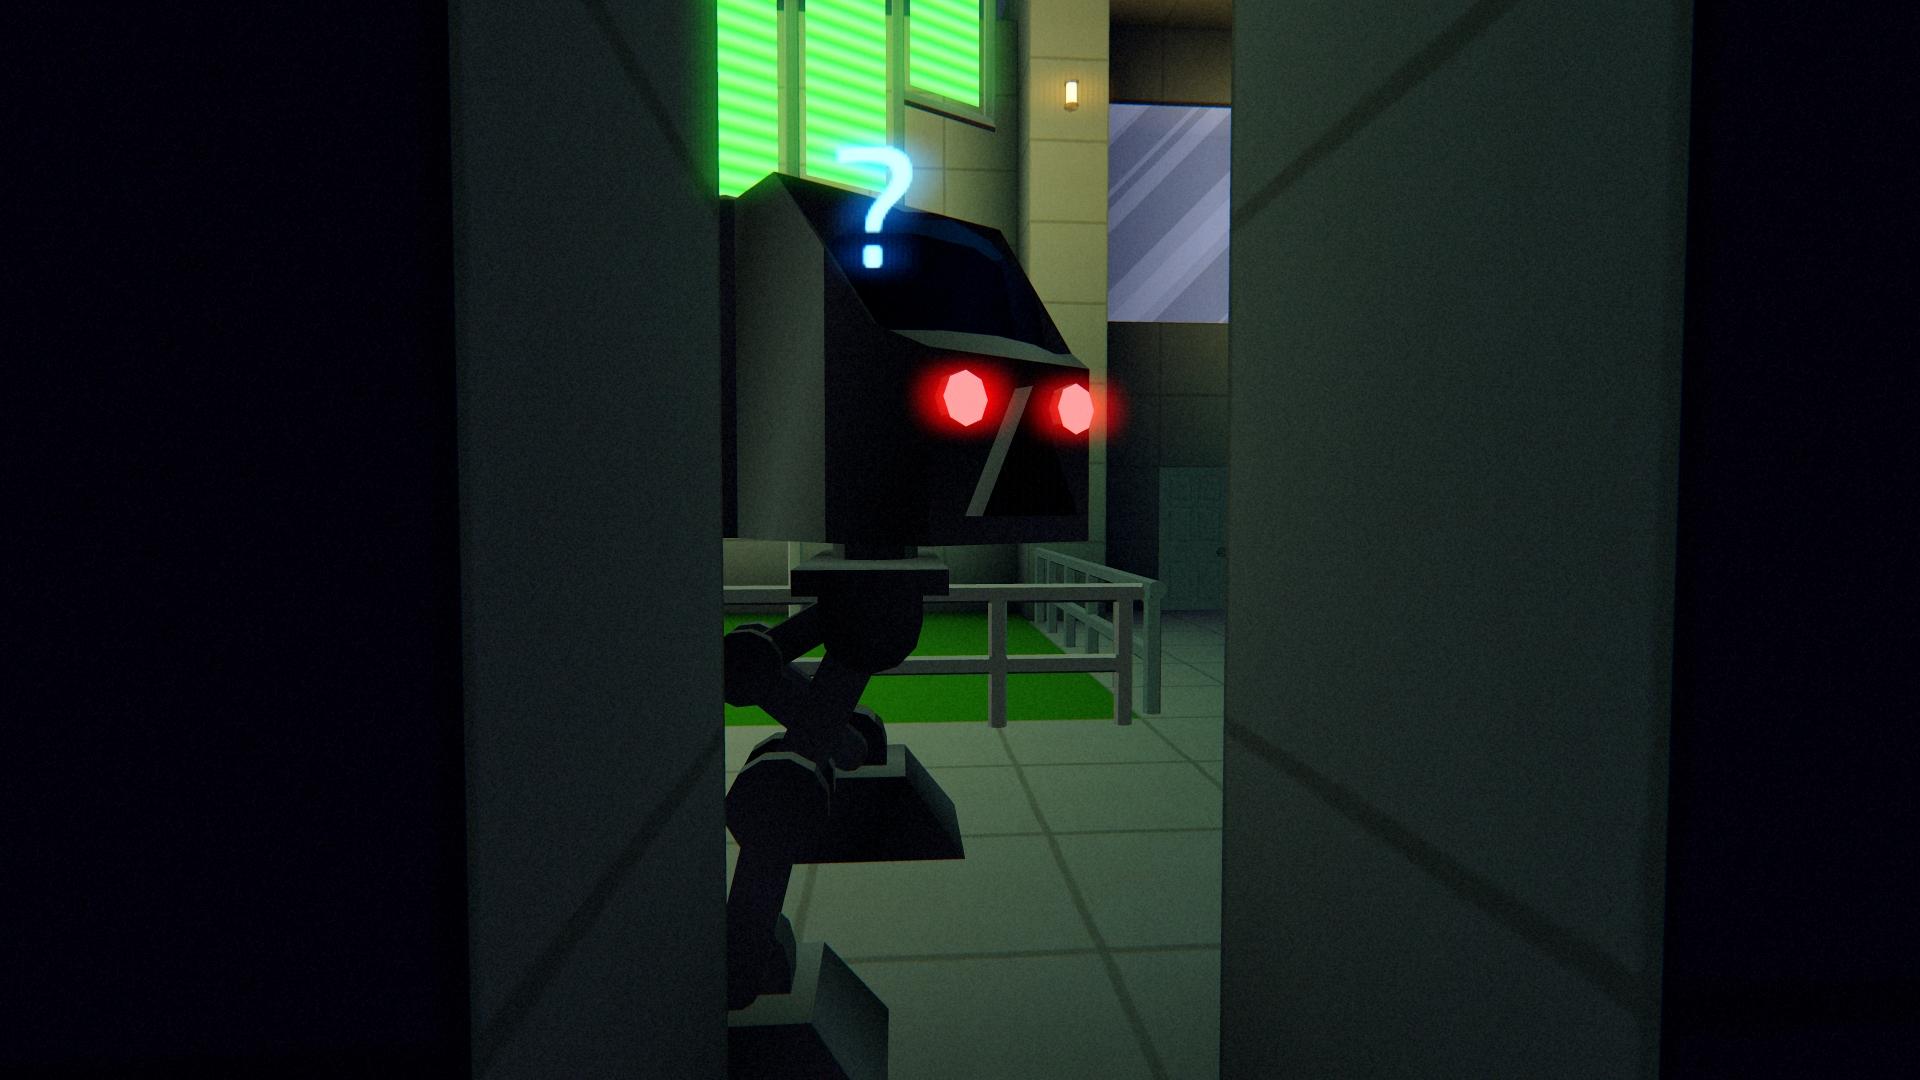 IMAGE(http://www.neonstruct.com/bin/3-mech.jpg)